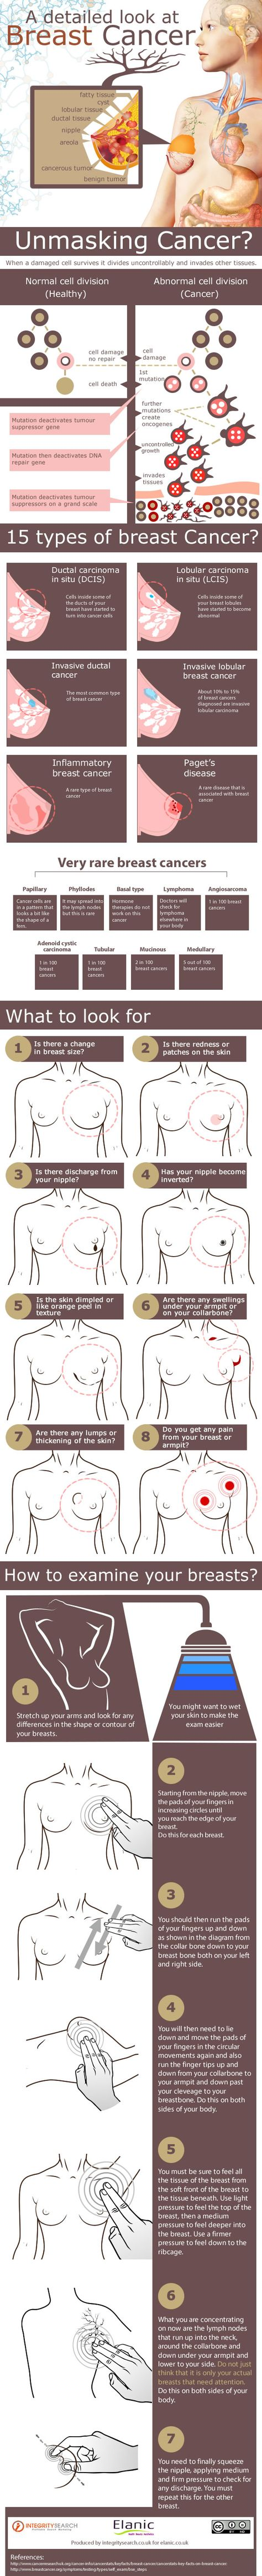 211 best Breast cancer images on Pinterest | Breast cancer, Cancer ...